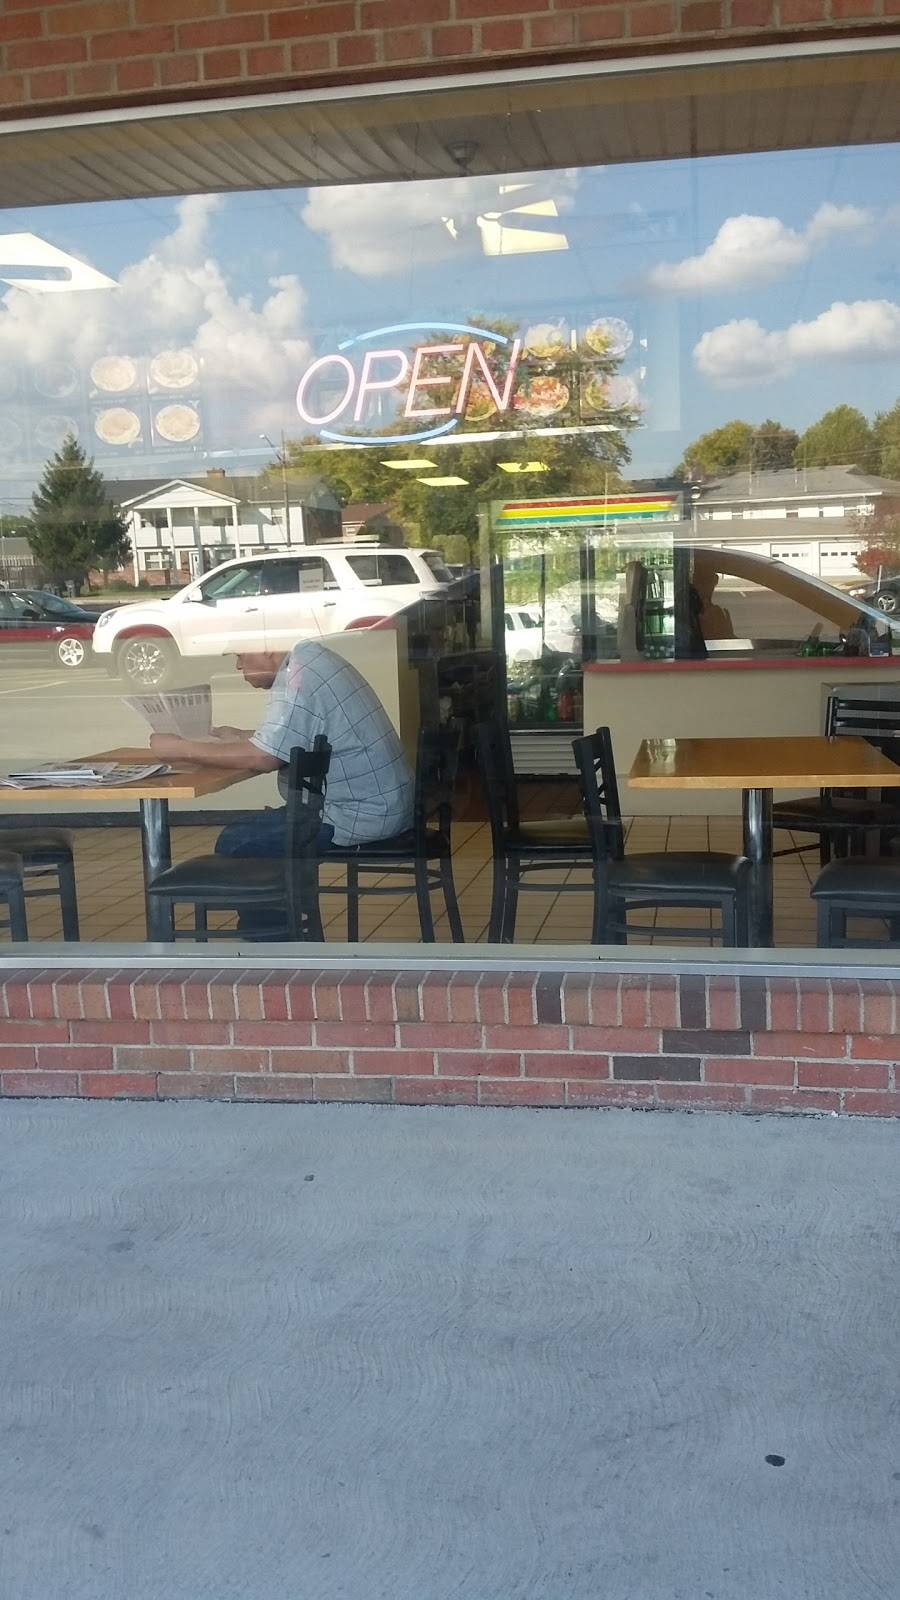 Rice King - restaurant  | Photo 3 of 4 | Address: 4400 Heatherdowns Blvd, Toledo, OH 43614, USA | Phone: (419) 381-8028